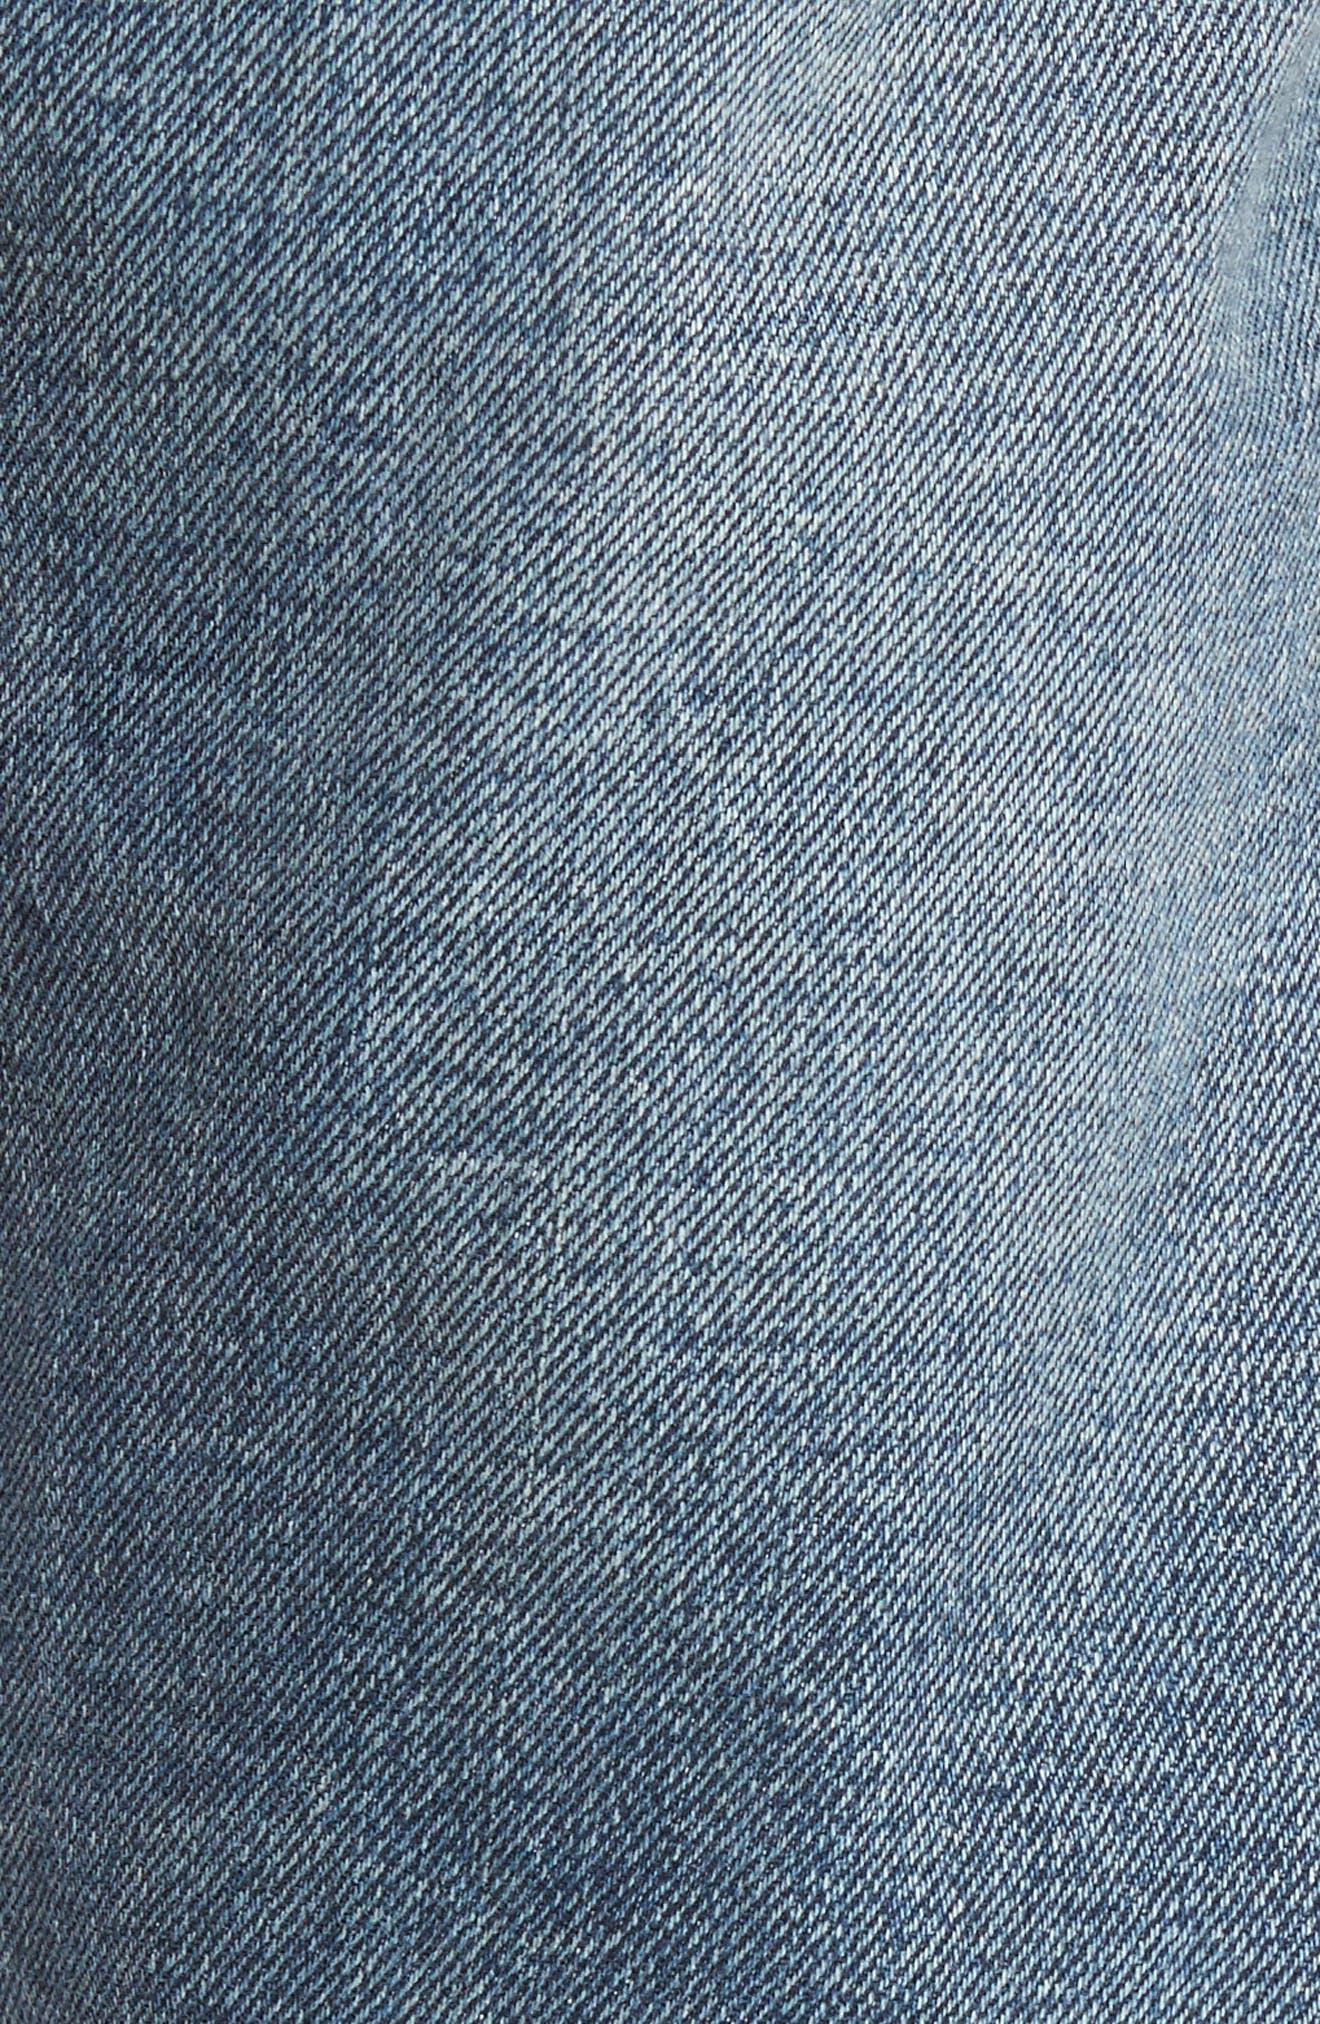 Alternate Image 5  - Levi's® 513™ Slim Straight Leg Jeans (Danz)